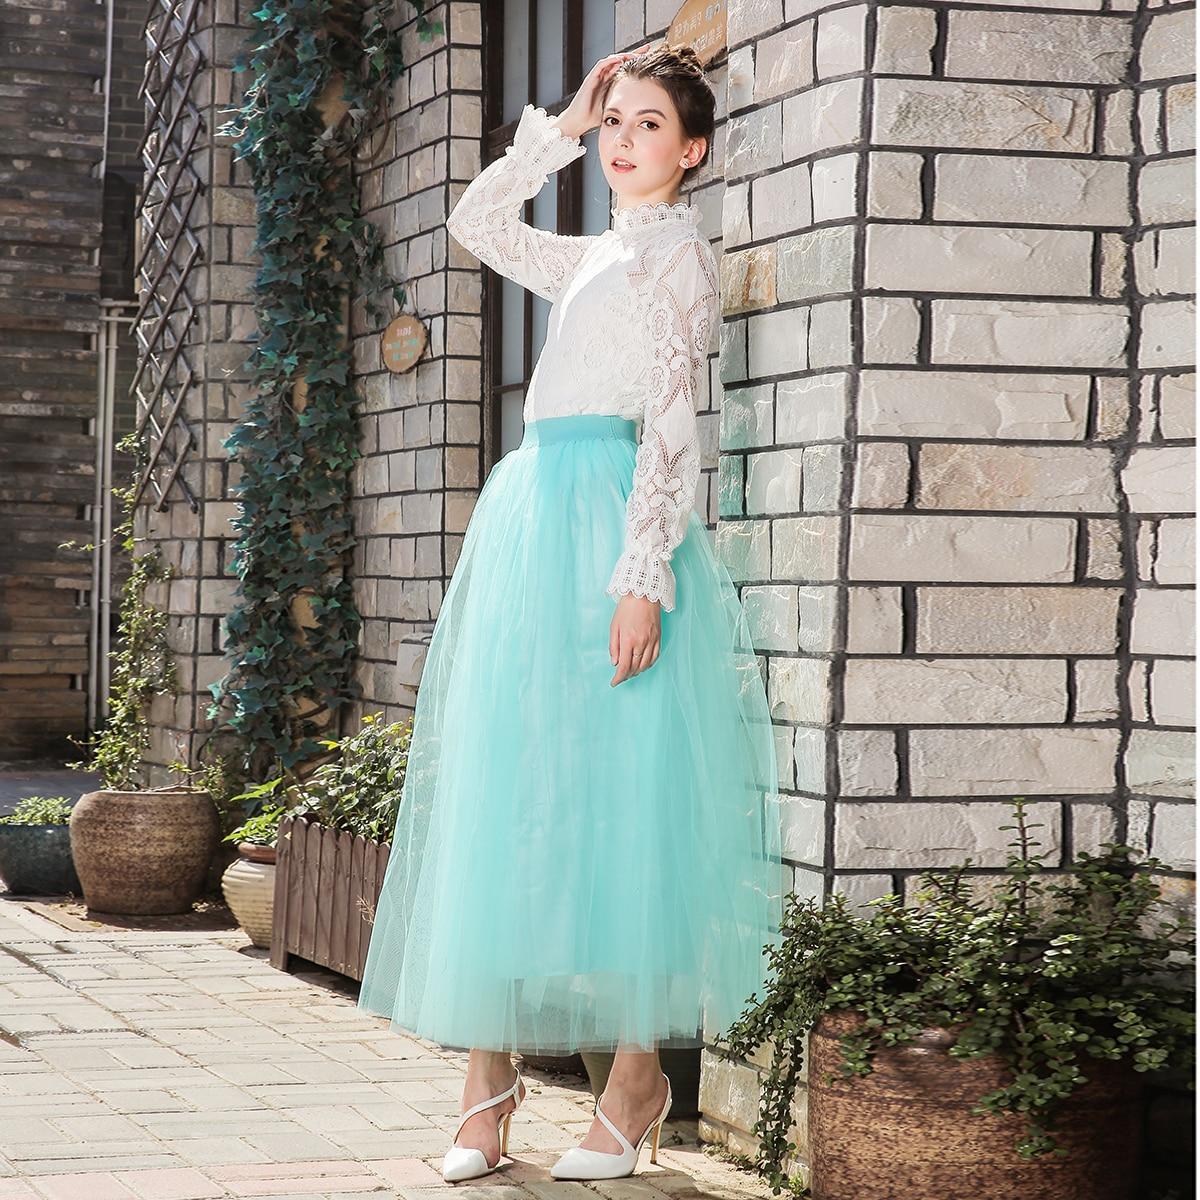 Bohemian Skirt Tulle Skirts Long Womens Maxi Skirts 4 Layers 100 Cm Mesh Pleated BridesmaidBall Gown Flared Saia Longa